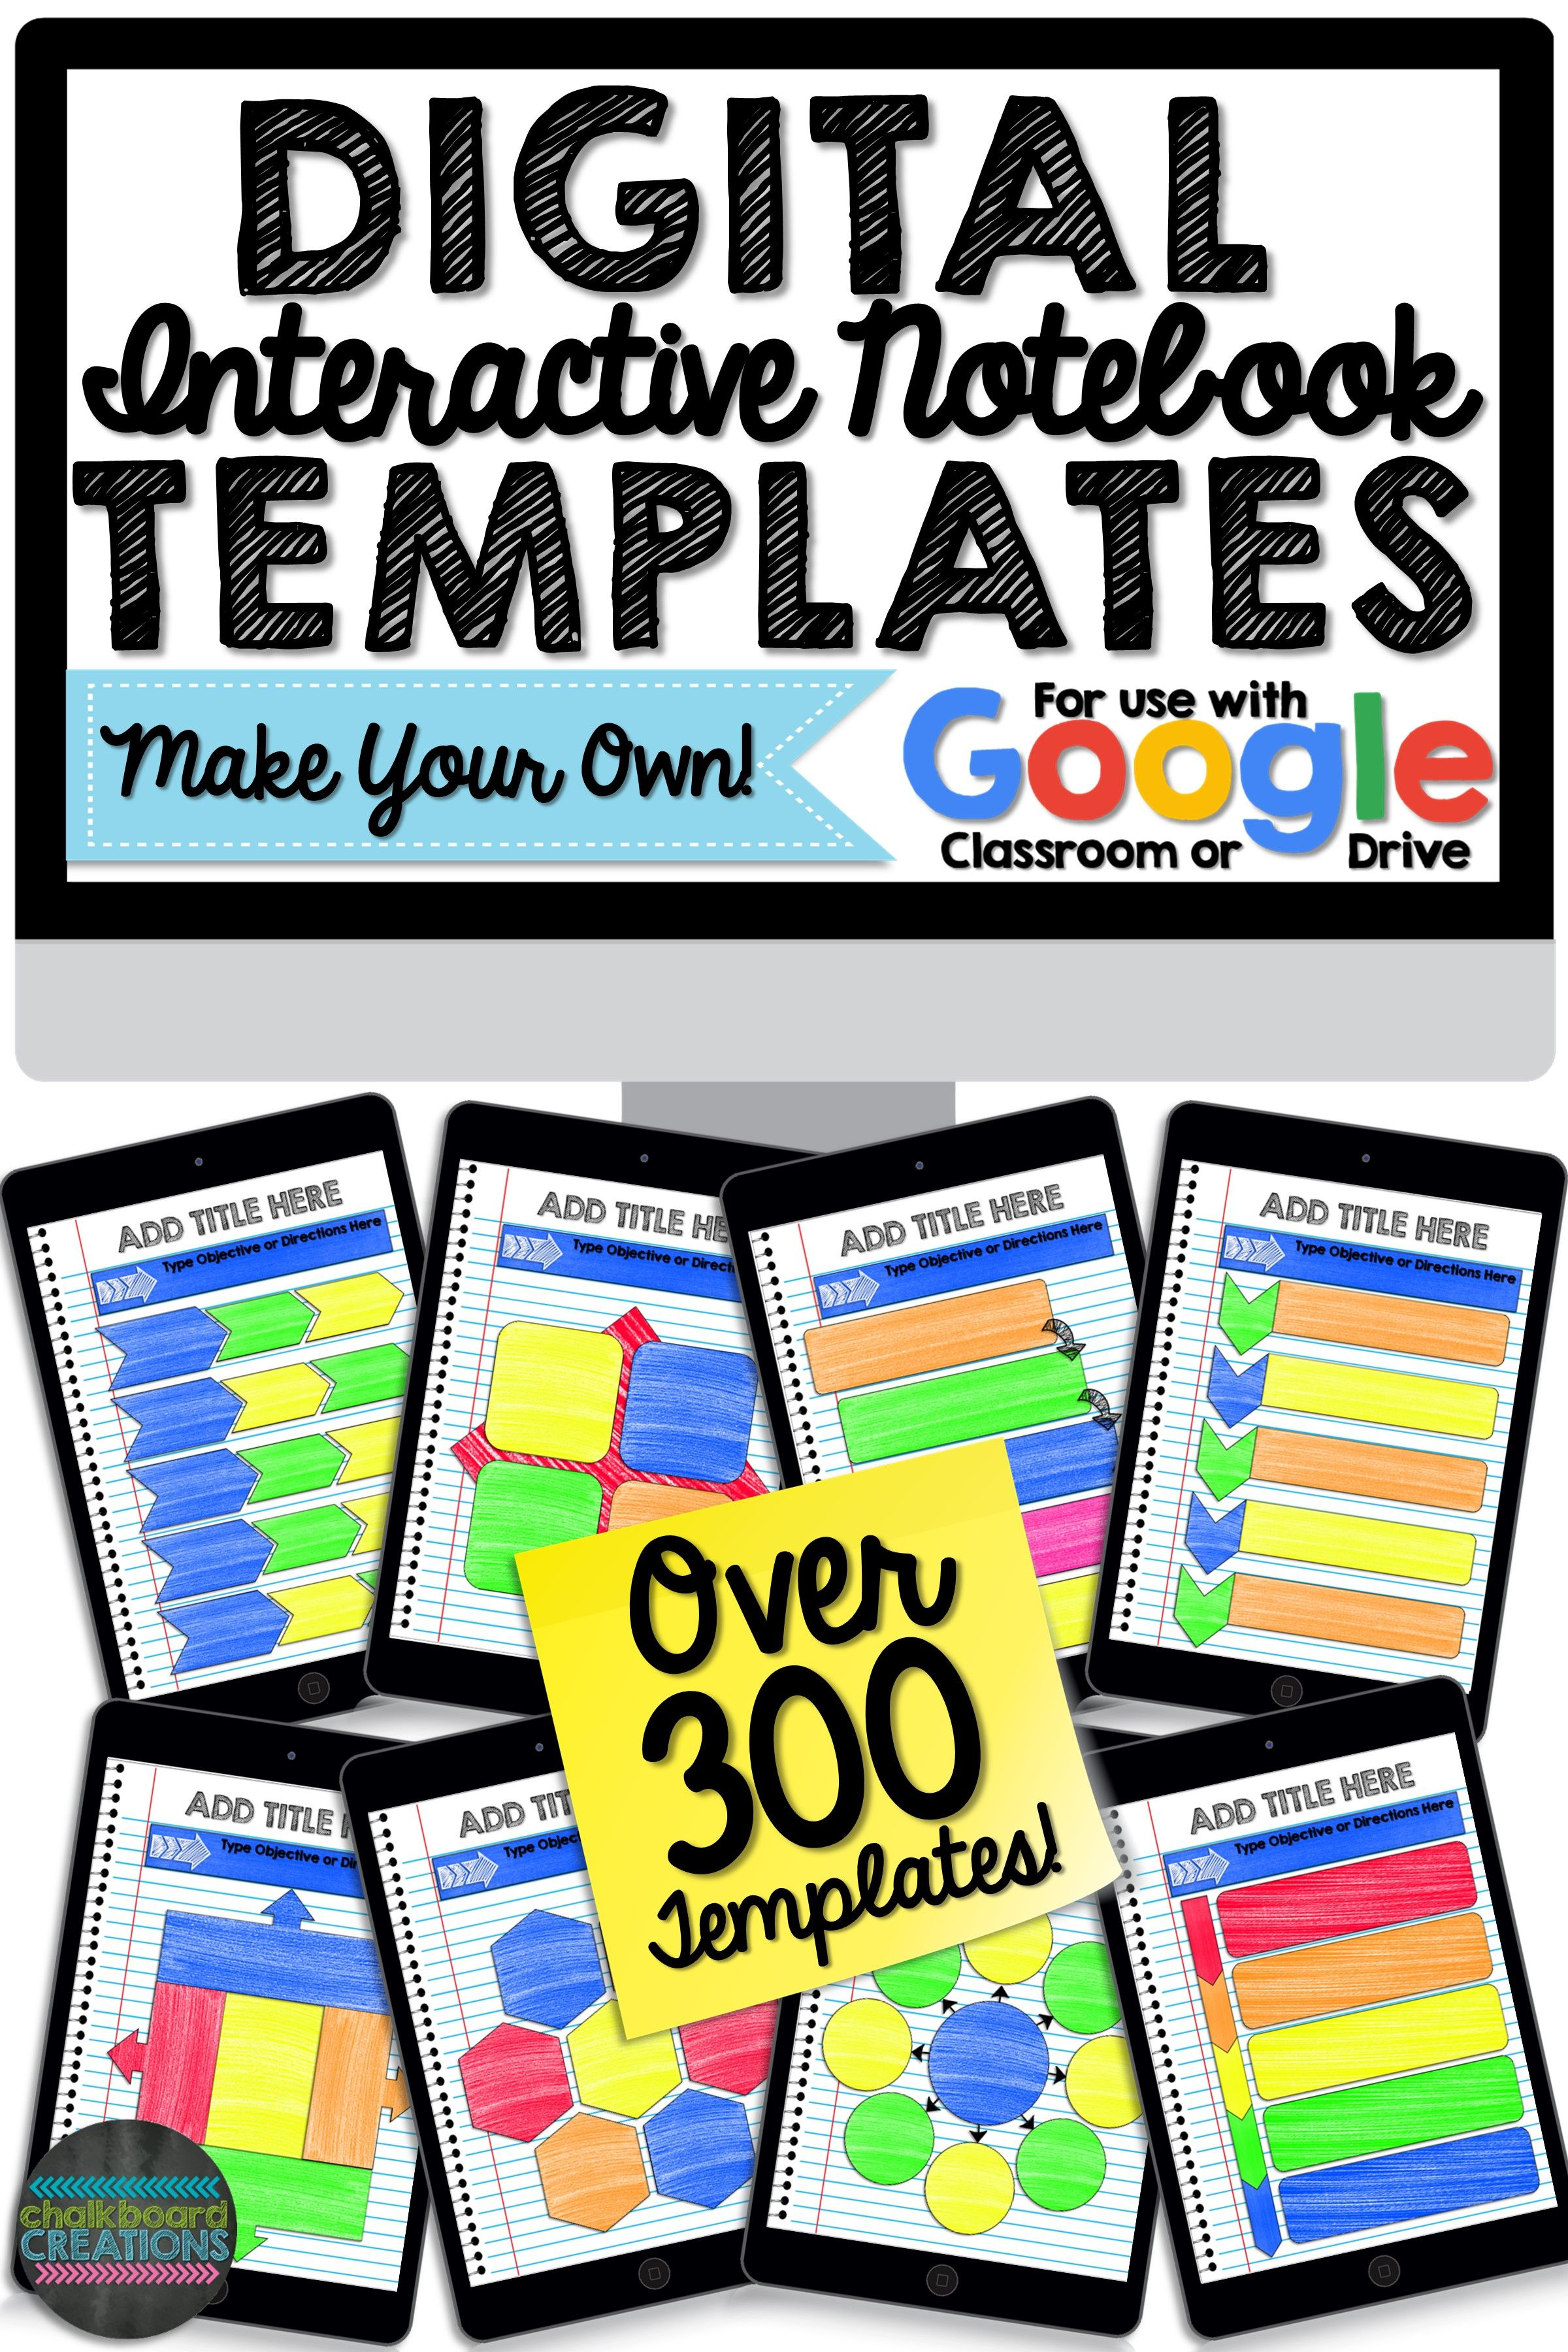 Digital Interactive Notebook & Graphic Organizer Template Bundle (GOOGLE)